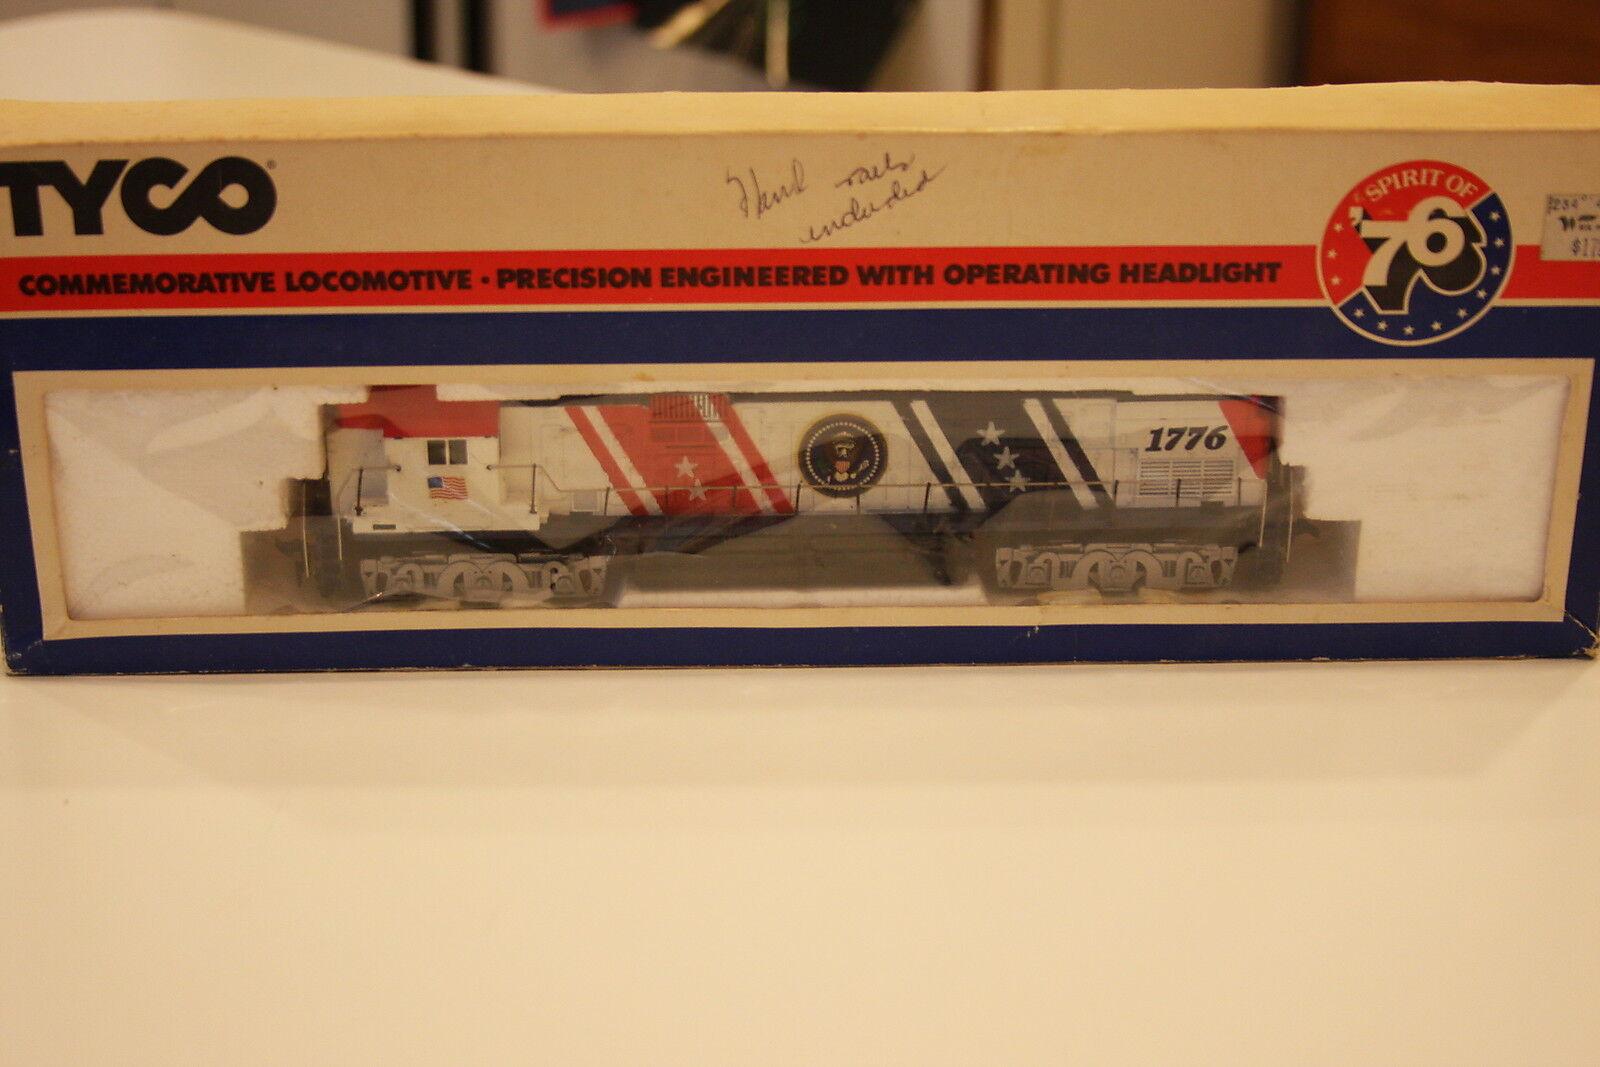 Tyco HO Super Spirit of '76'   246 Locomotive Rare Hand Rails Intact